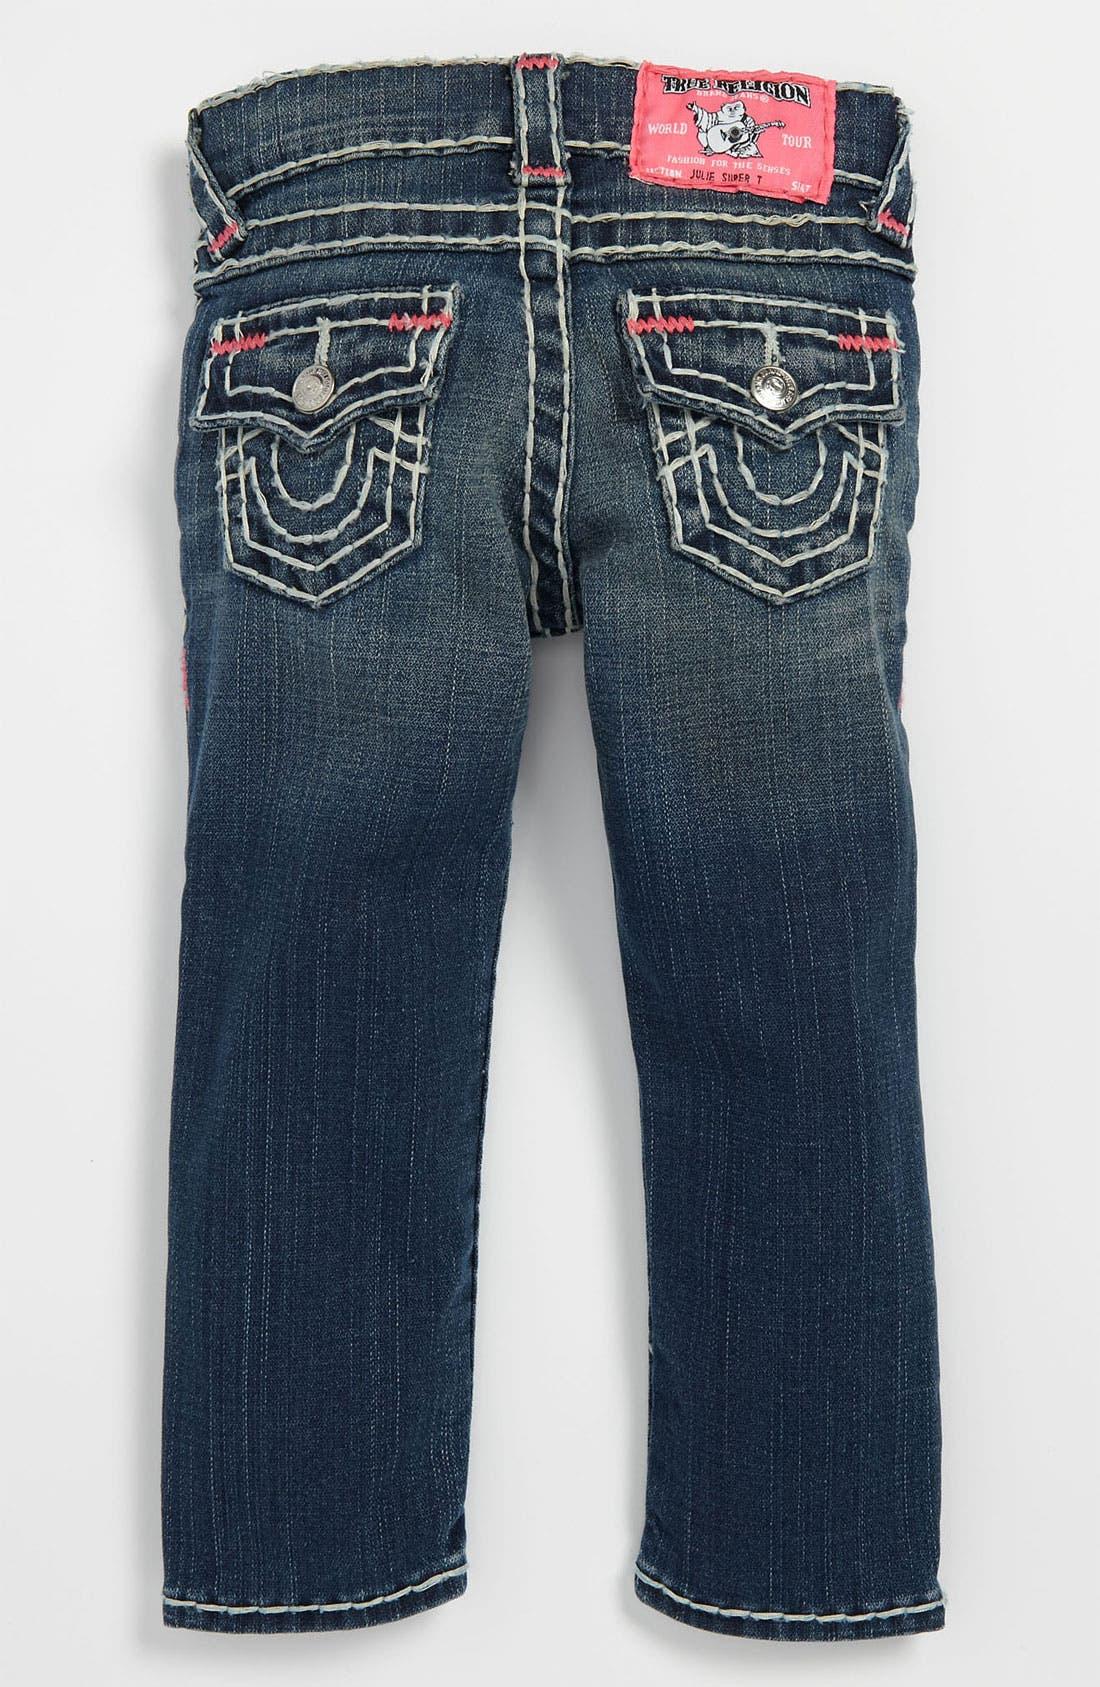 Alternate Image 1 Selected - True Religion Brand Jeans 'Julie' Skinny Leg Jeans (Toddler)